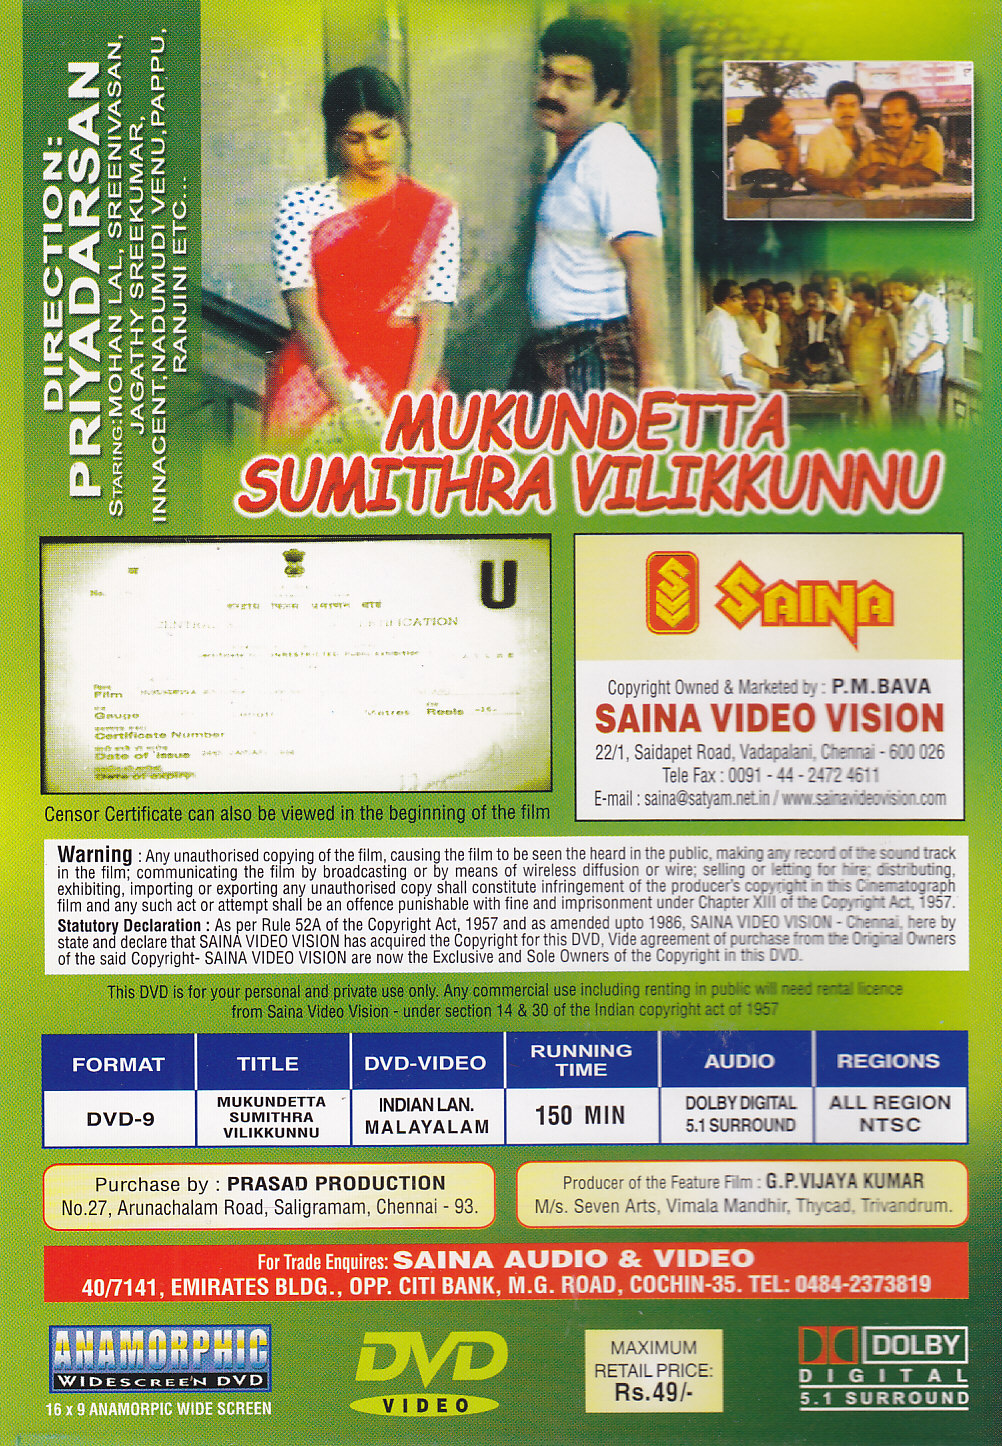 Mukundetta Sumithra Vilikyunnu Saina DVD Screenshots Mukundetta_Sumithra_vilikkunnu_B